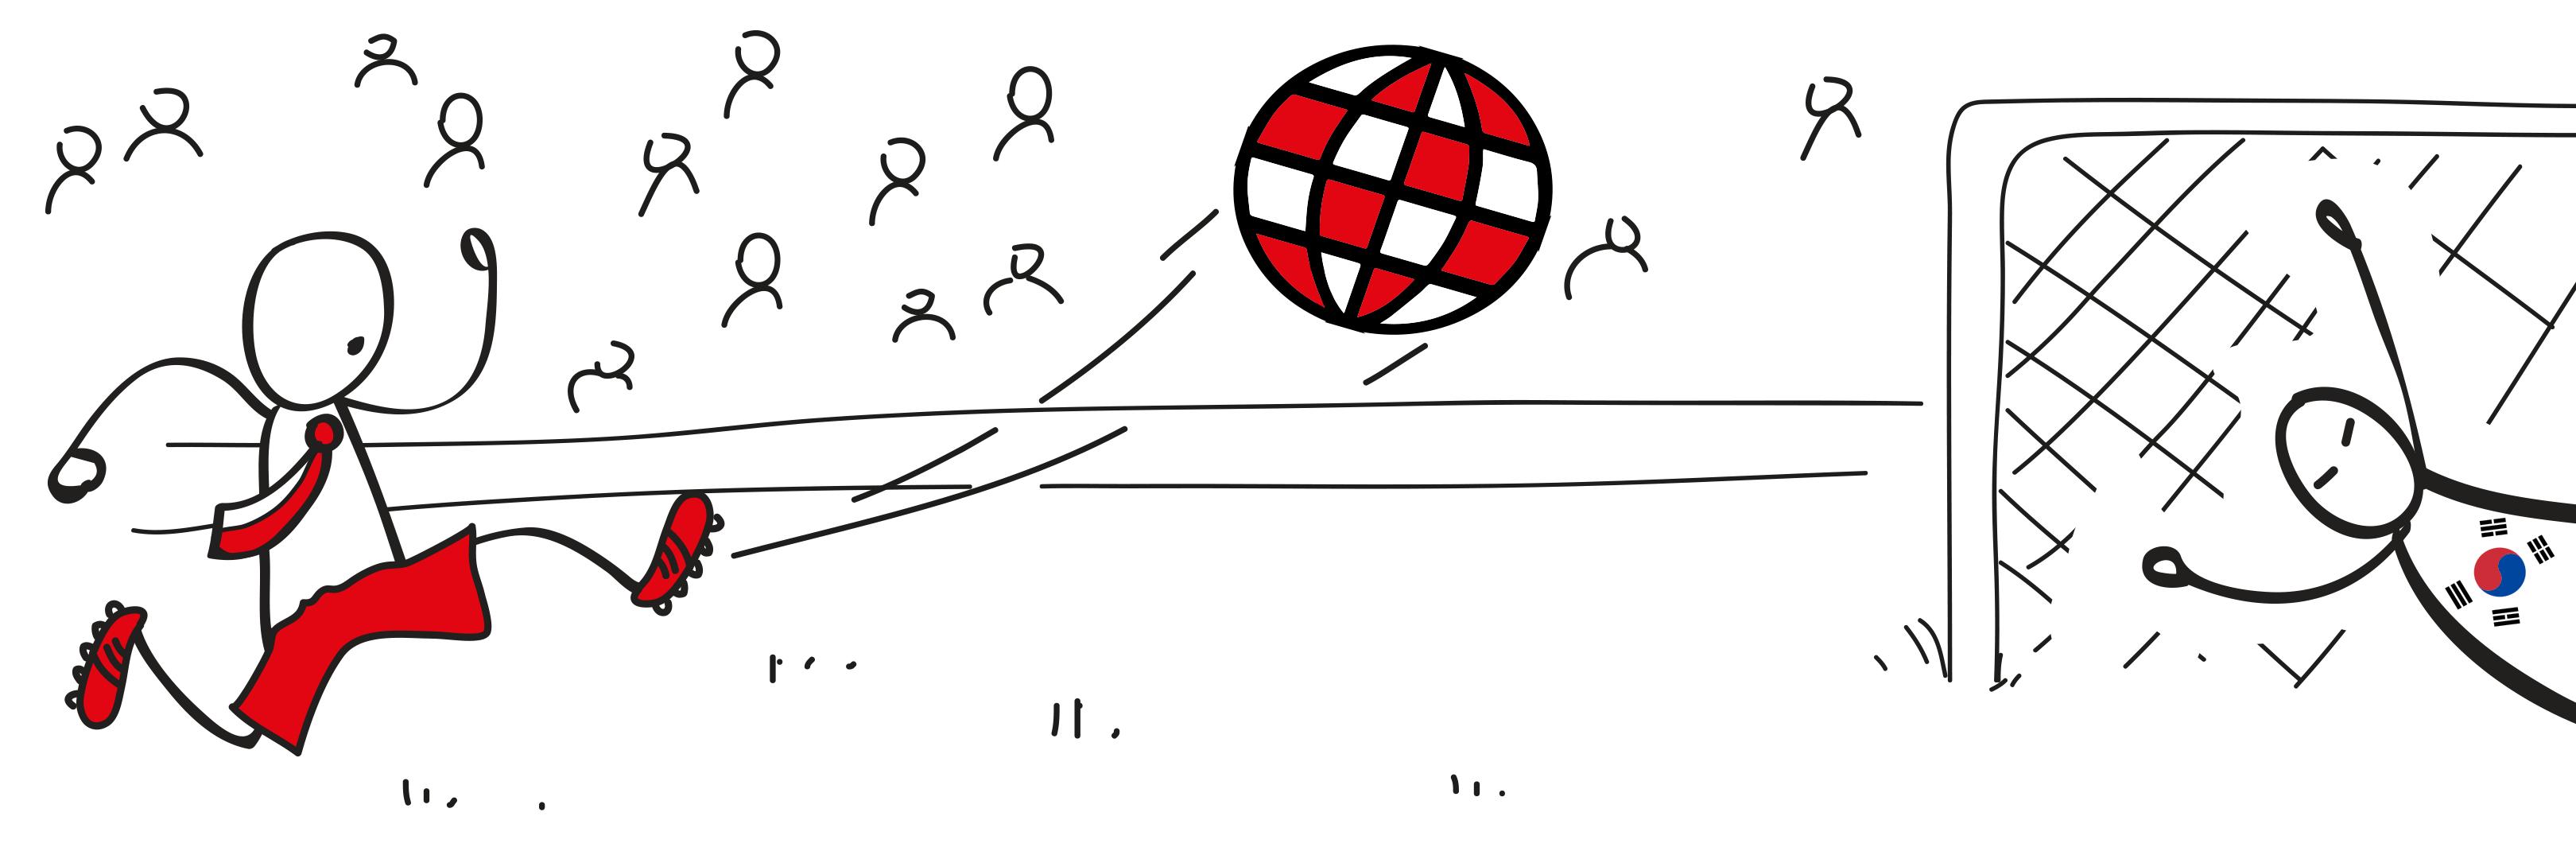 Polska vs Korea... w internecie